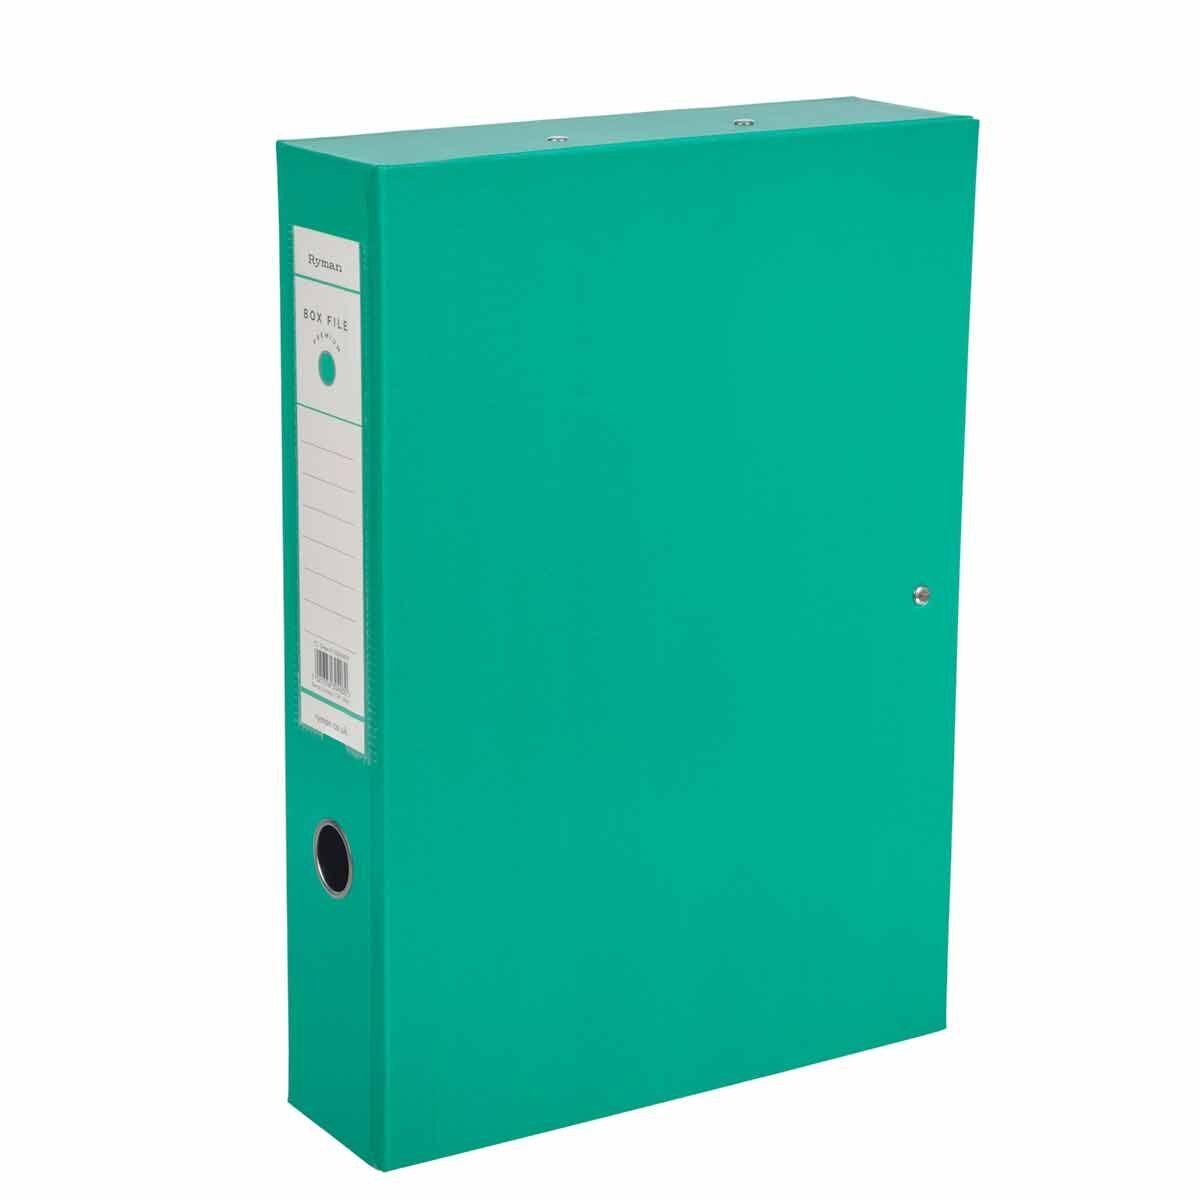 Ryman Premium Box File Foolscap Pack of 10 Green